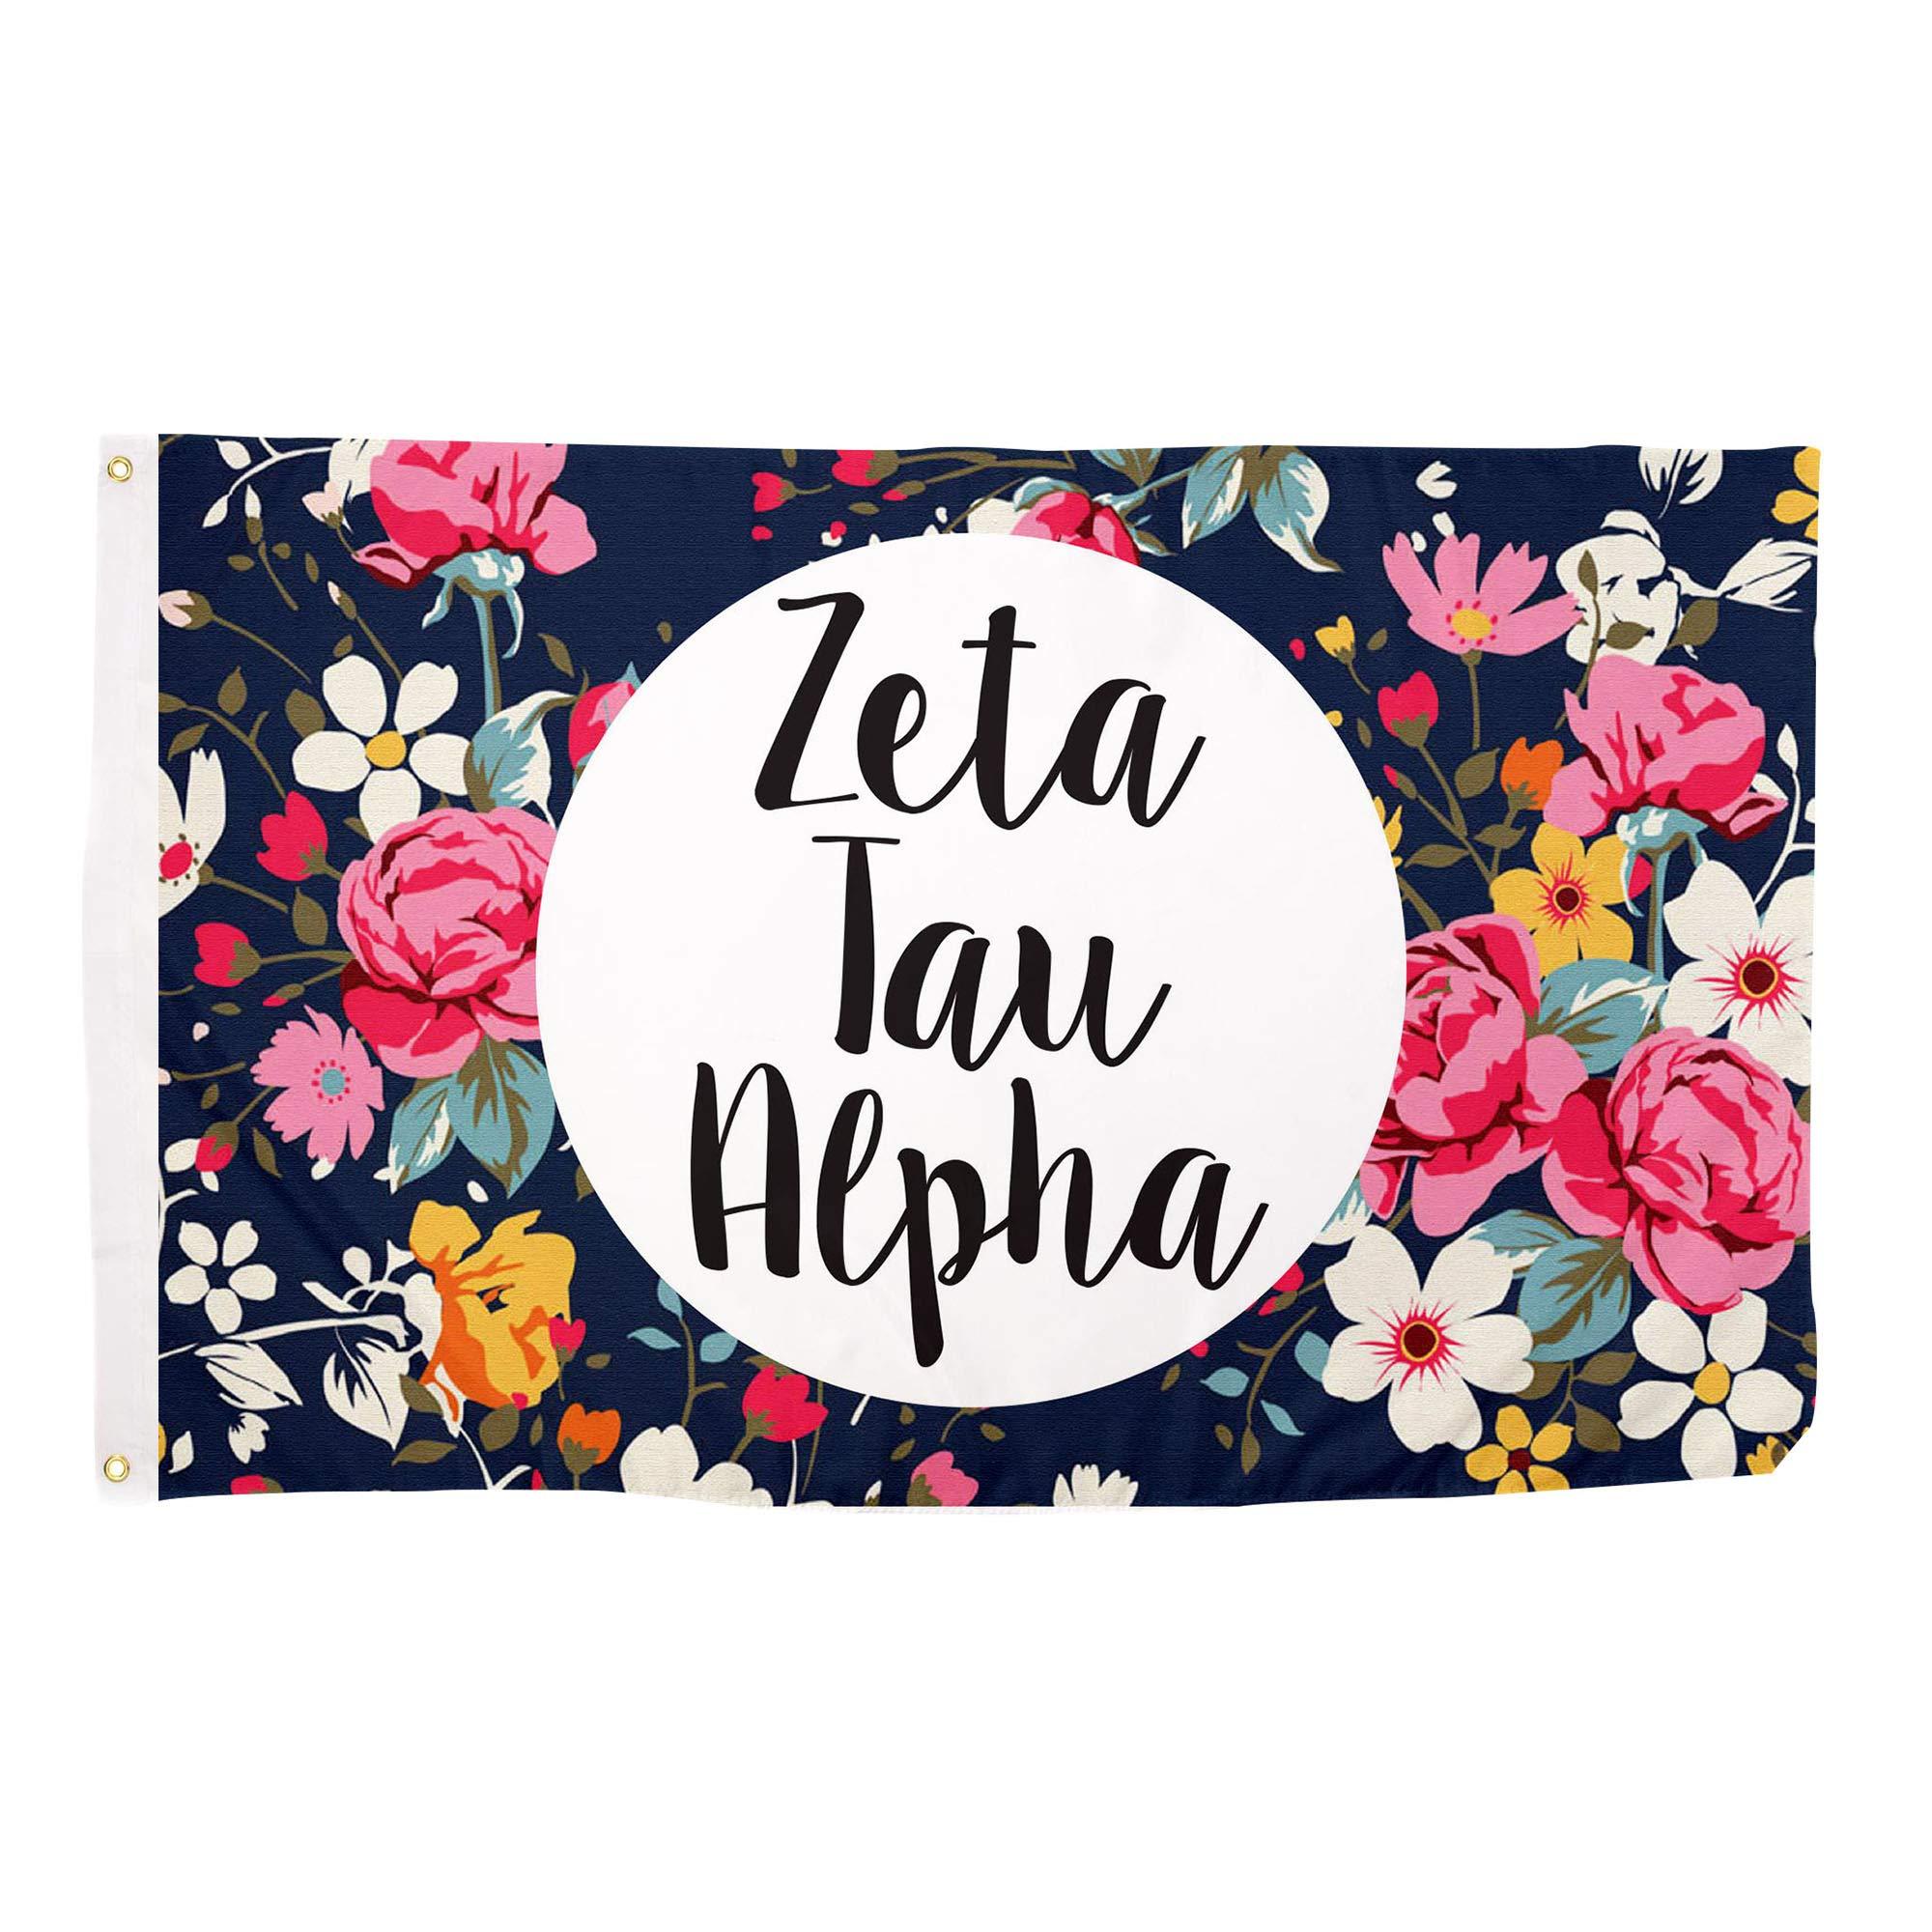 Zeta Tau Alpha Floral Sorority Flag Greek Letter Use as a Banner Large 3 x 5 Feet Sign Decor Zeta by Desert Cactus